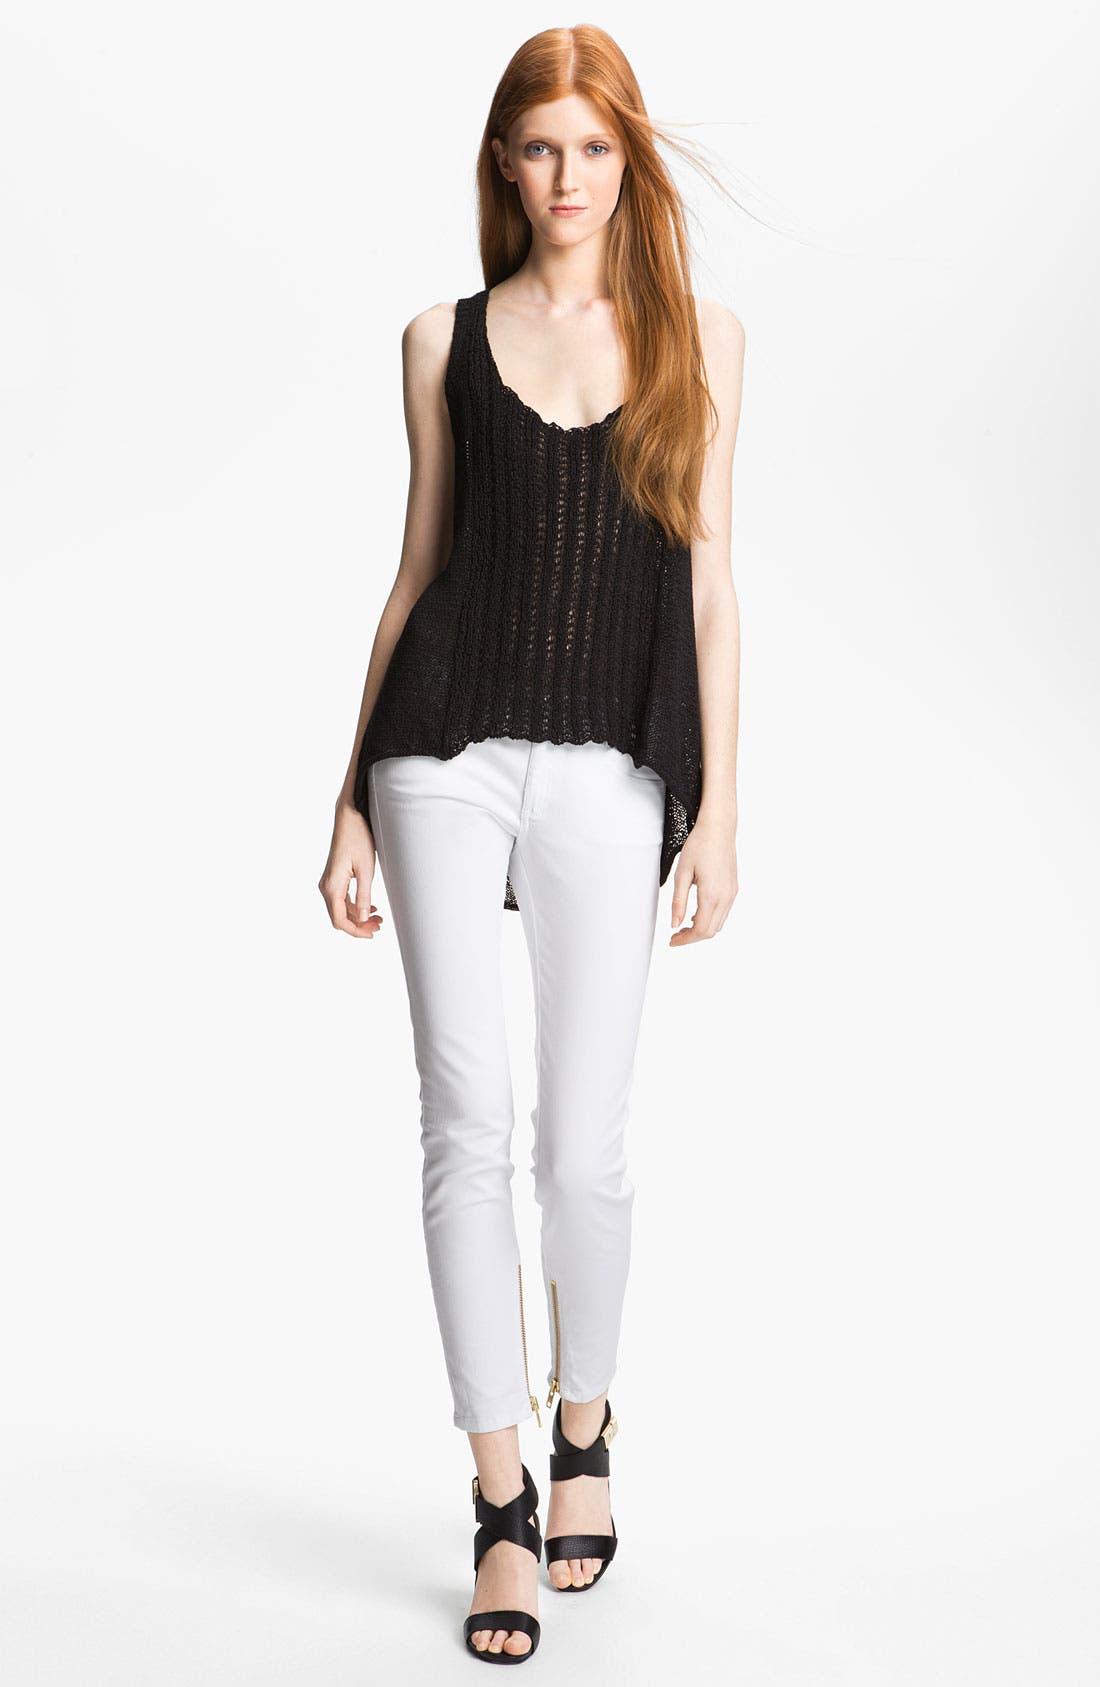 Alternate Image 1 Selected - Rachel Zoe 'Harley' High/Low Knit Tank